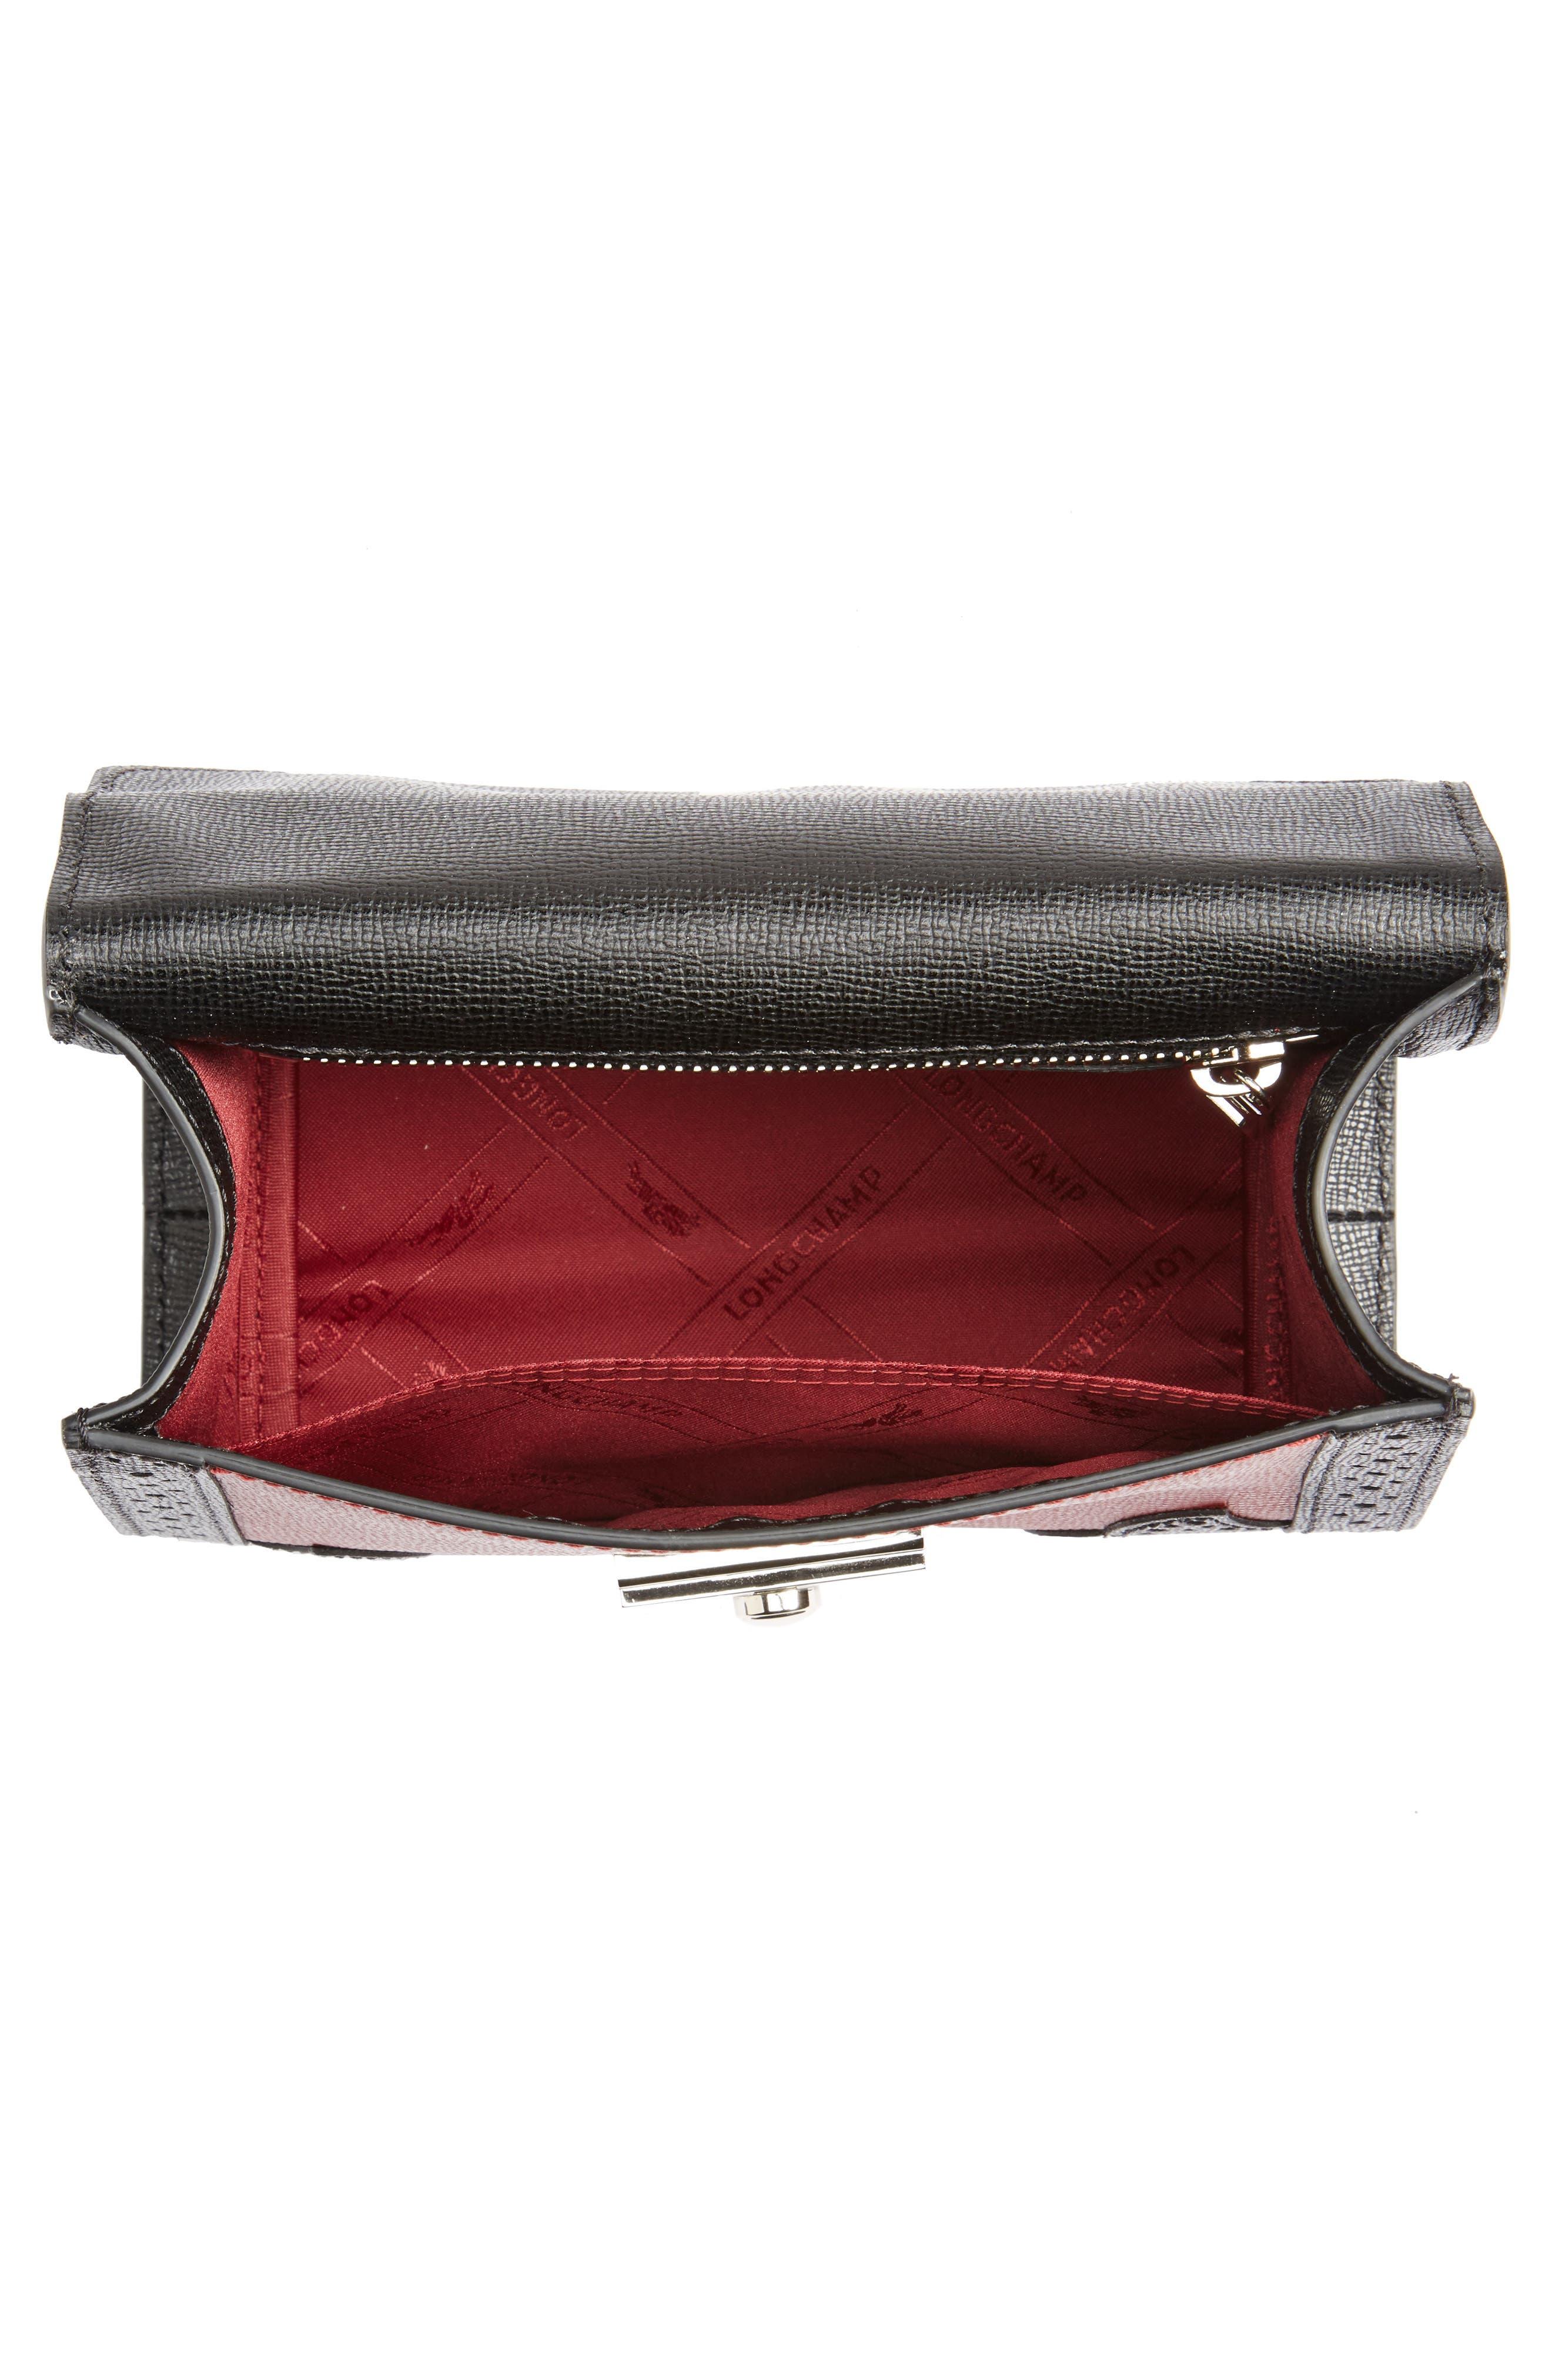 Effrontée Leather Crossbody Bag,                             Alternate thumbnail 3, color,                             Red Lacquer